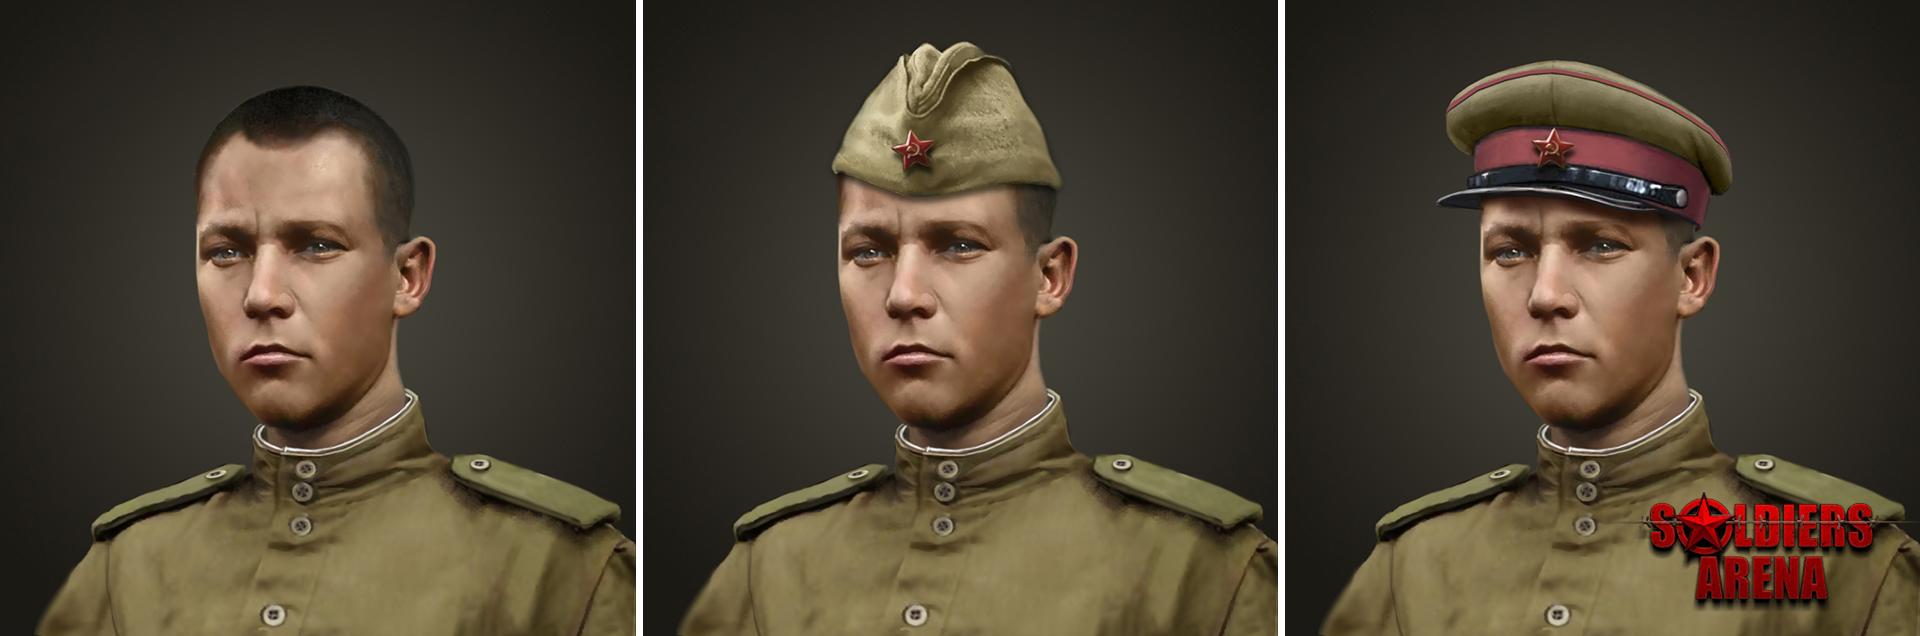 Портрет пехотного командира - Soldiers: Arena Арт